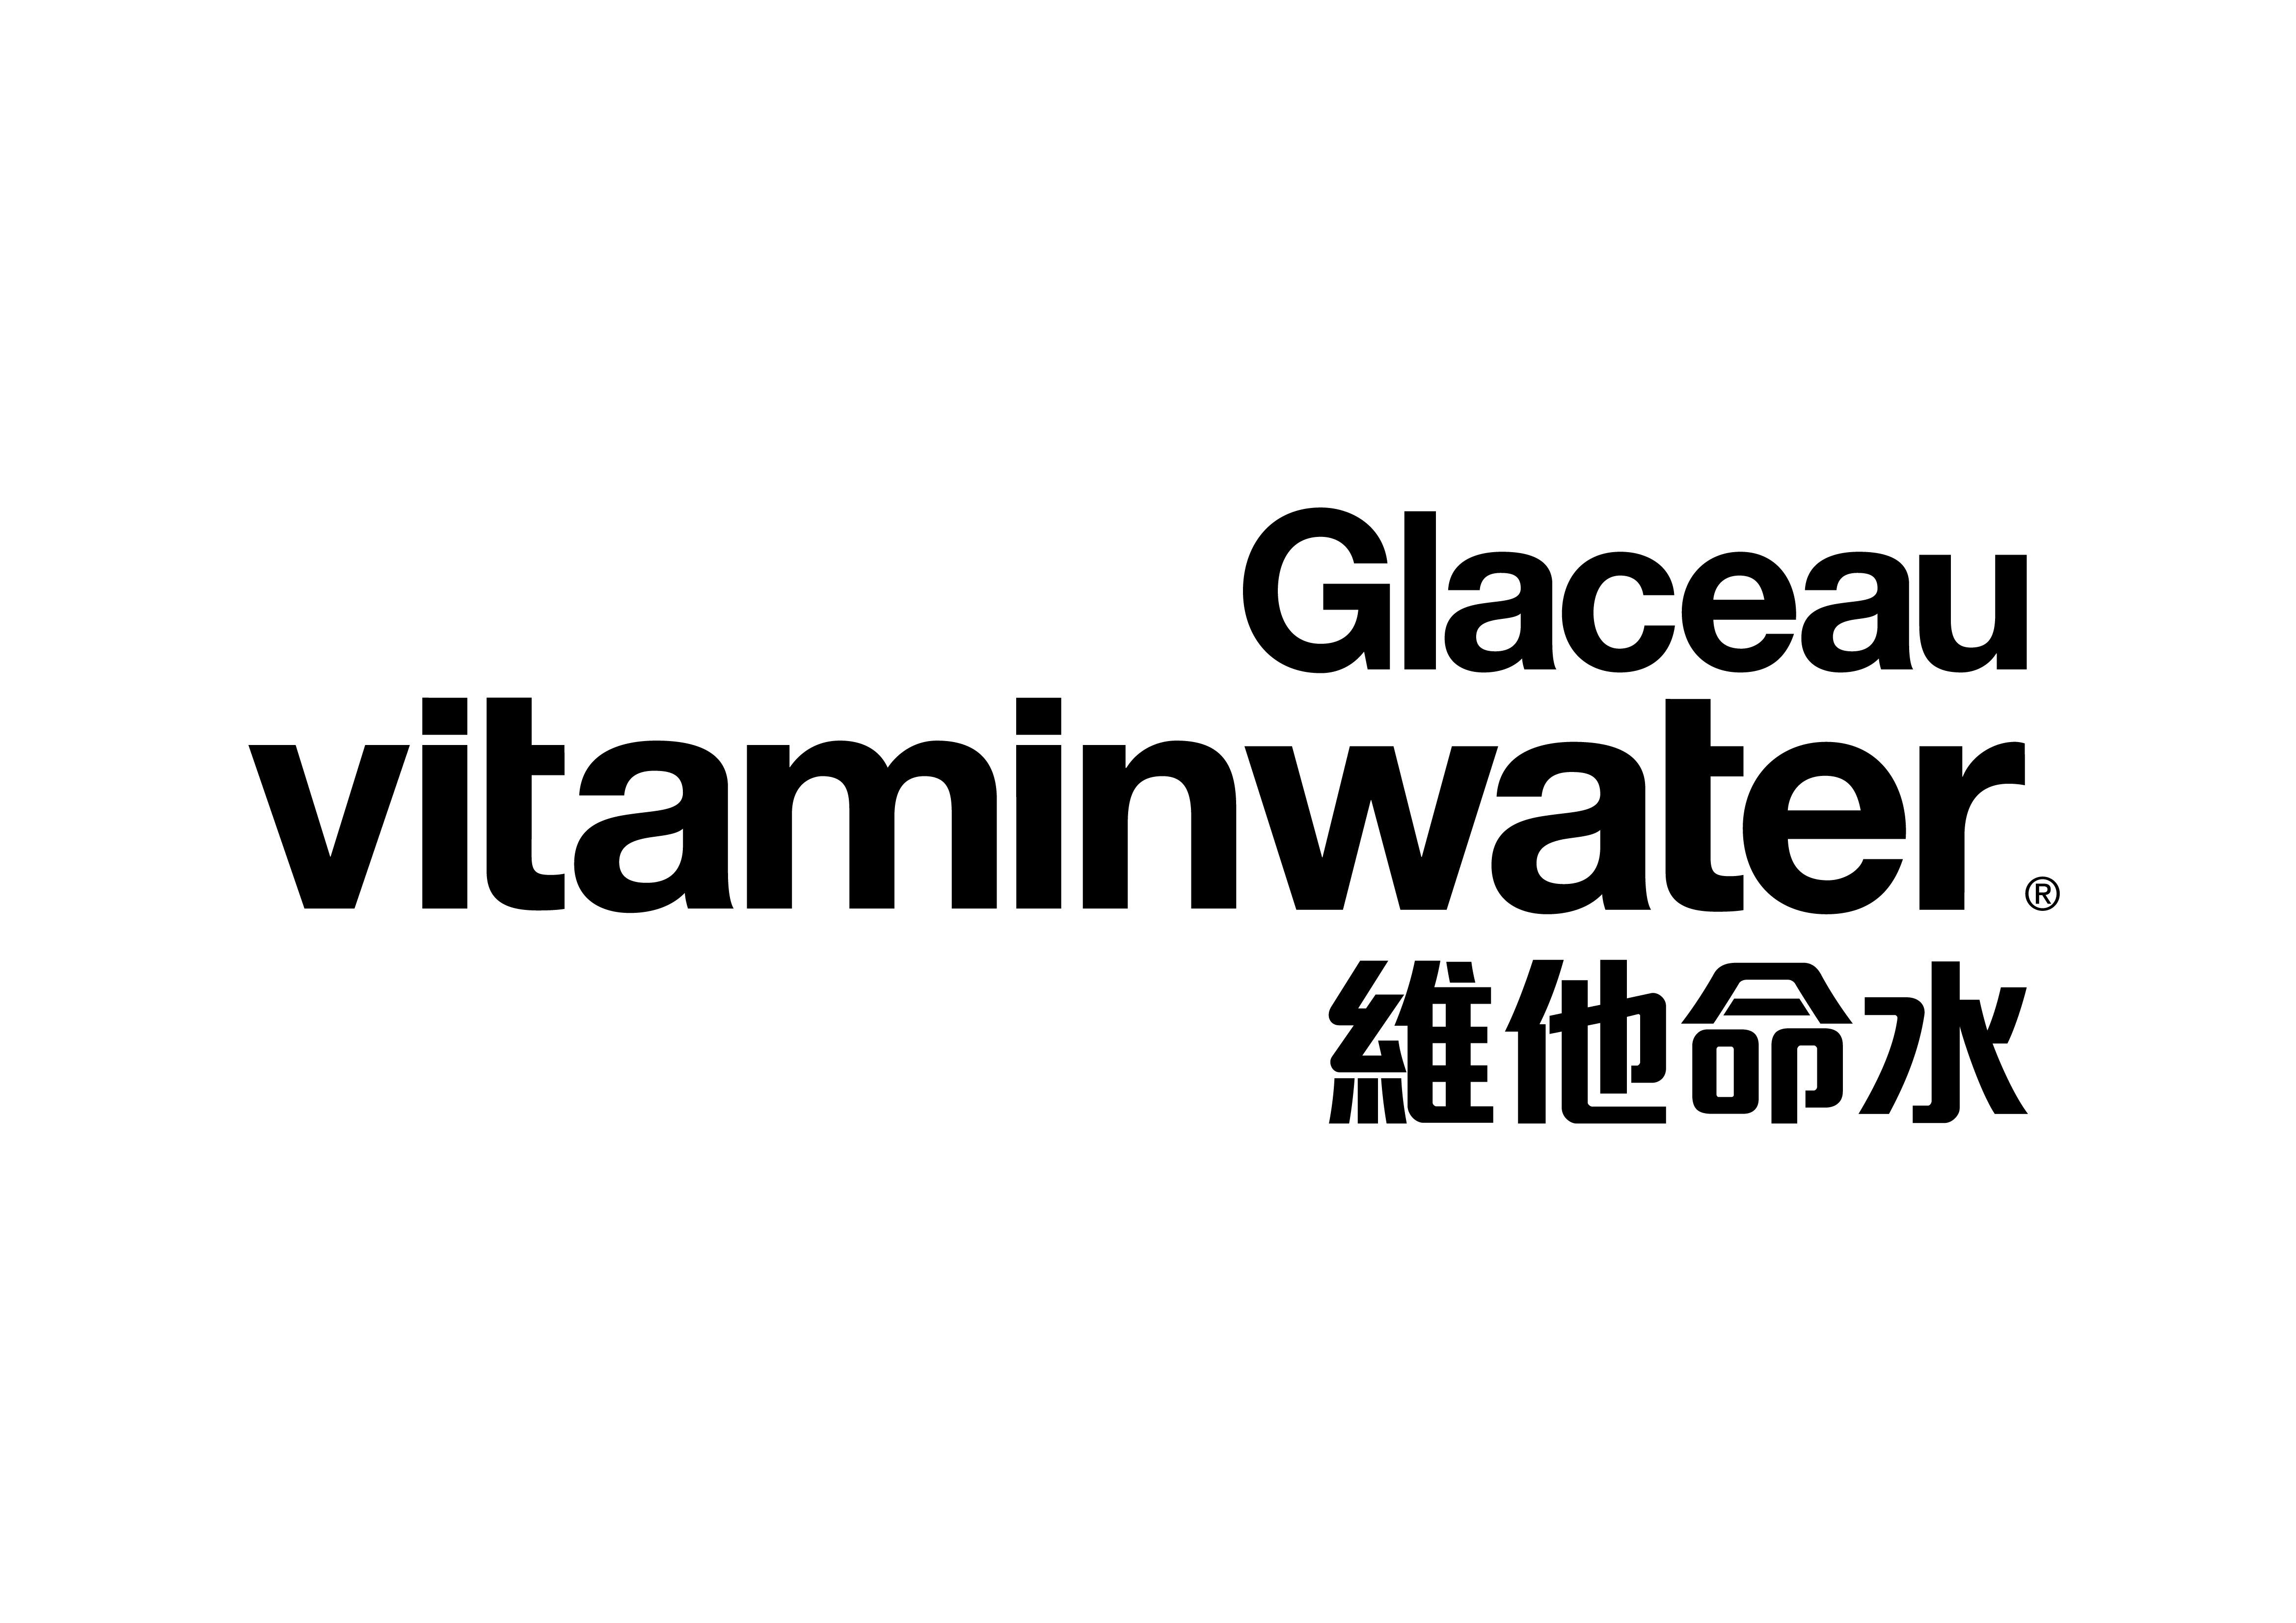 Glaceau vitaminwater logo